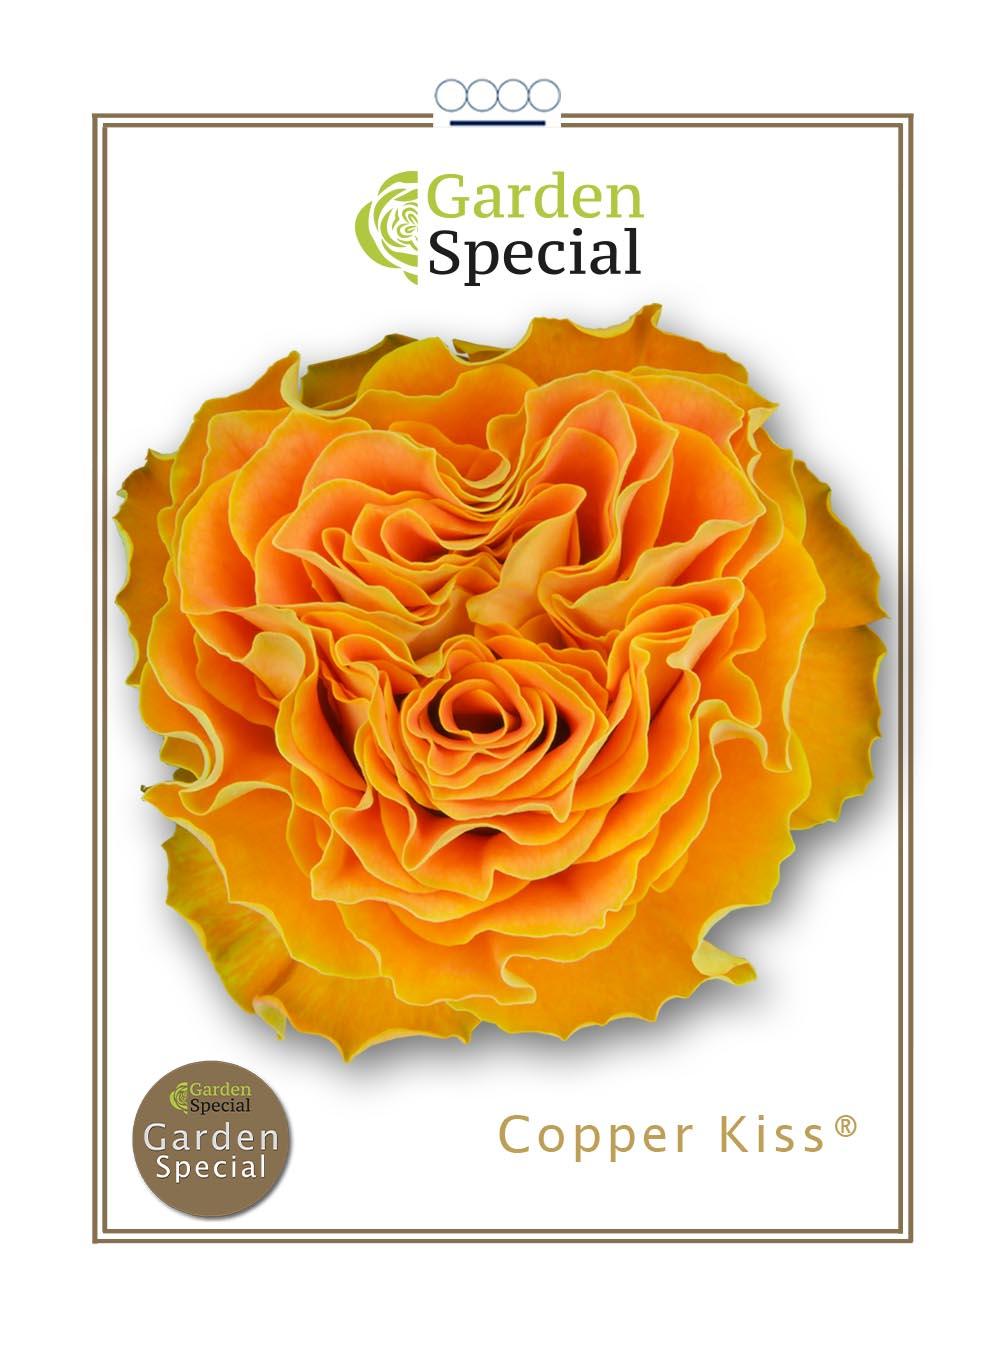 Copper Kiss®